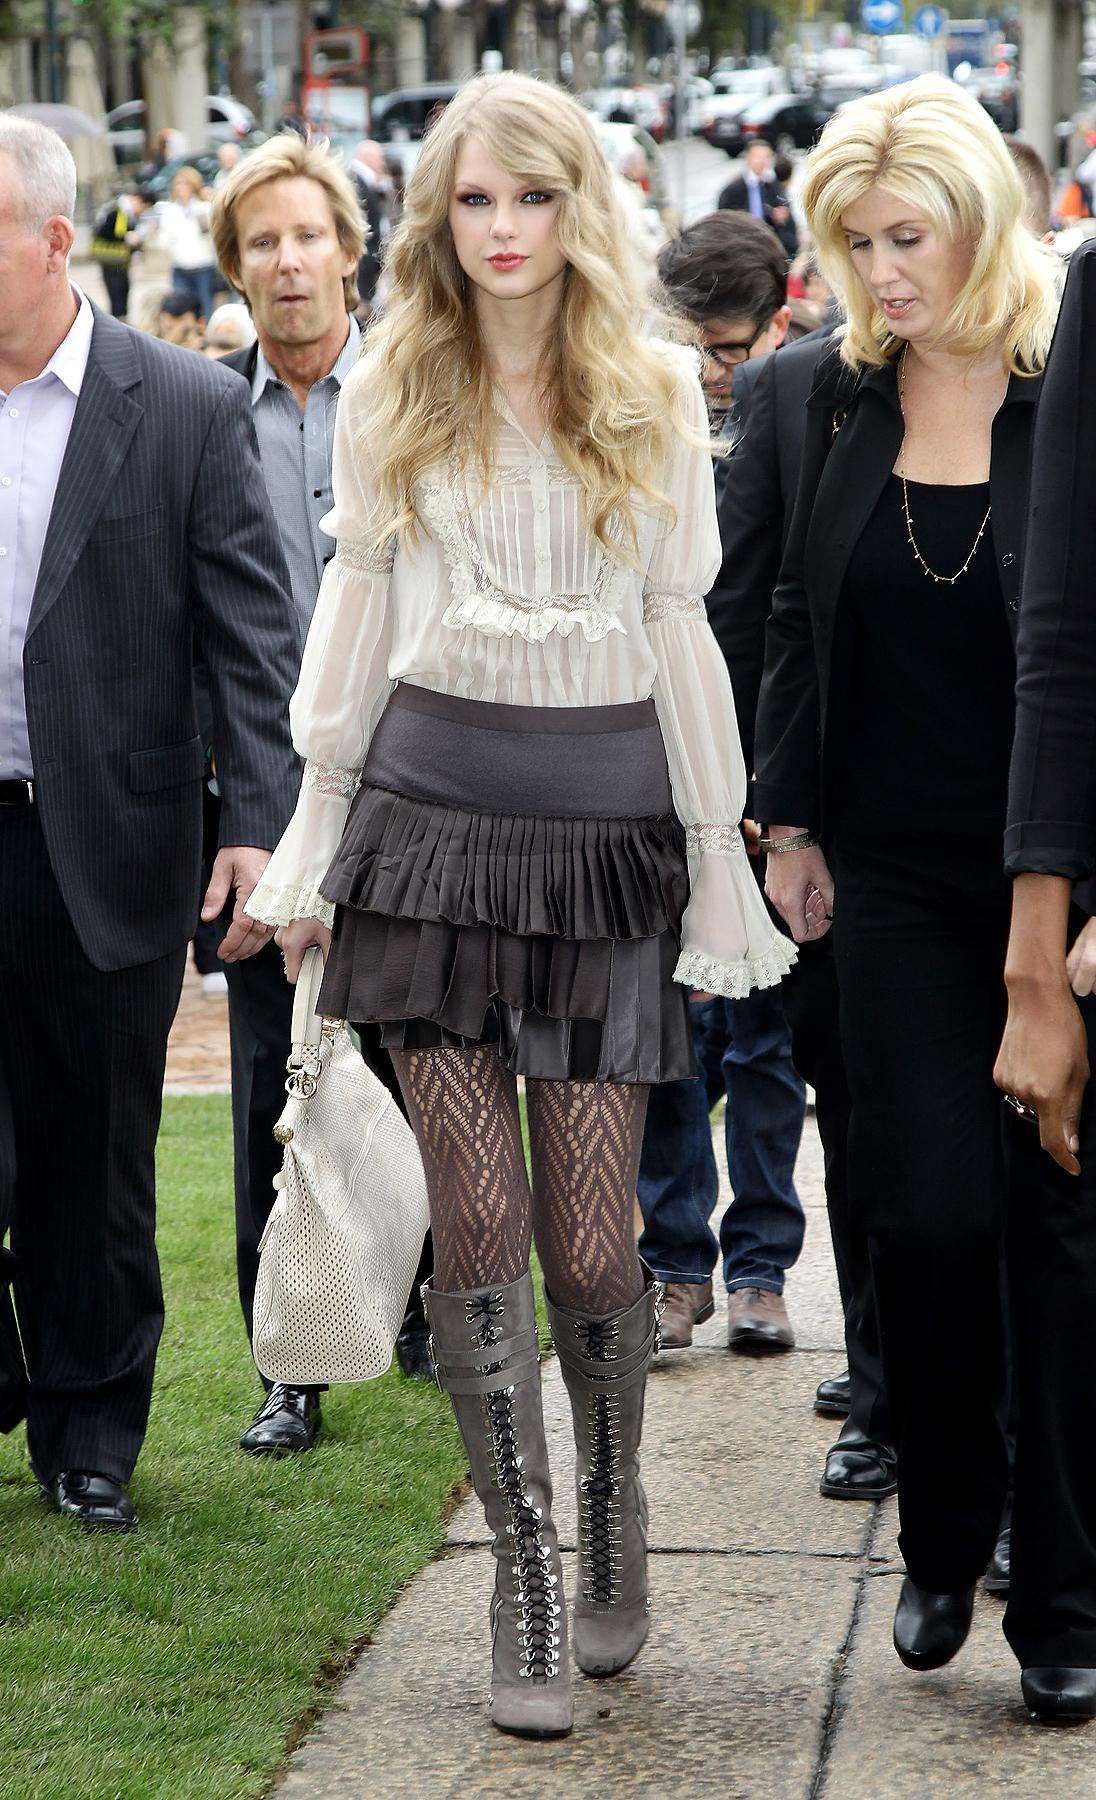 Taylor Swift's Sassy New Look: Yay or Nay? (PHOTOS)